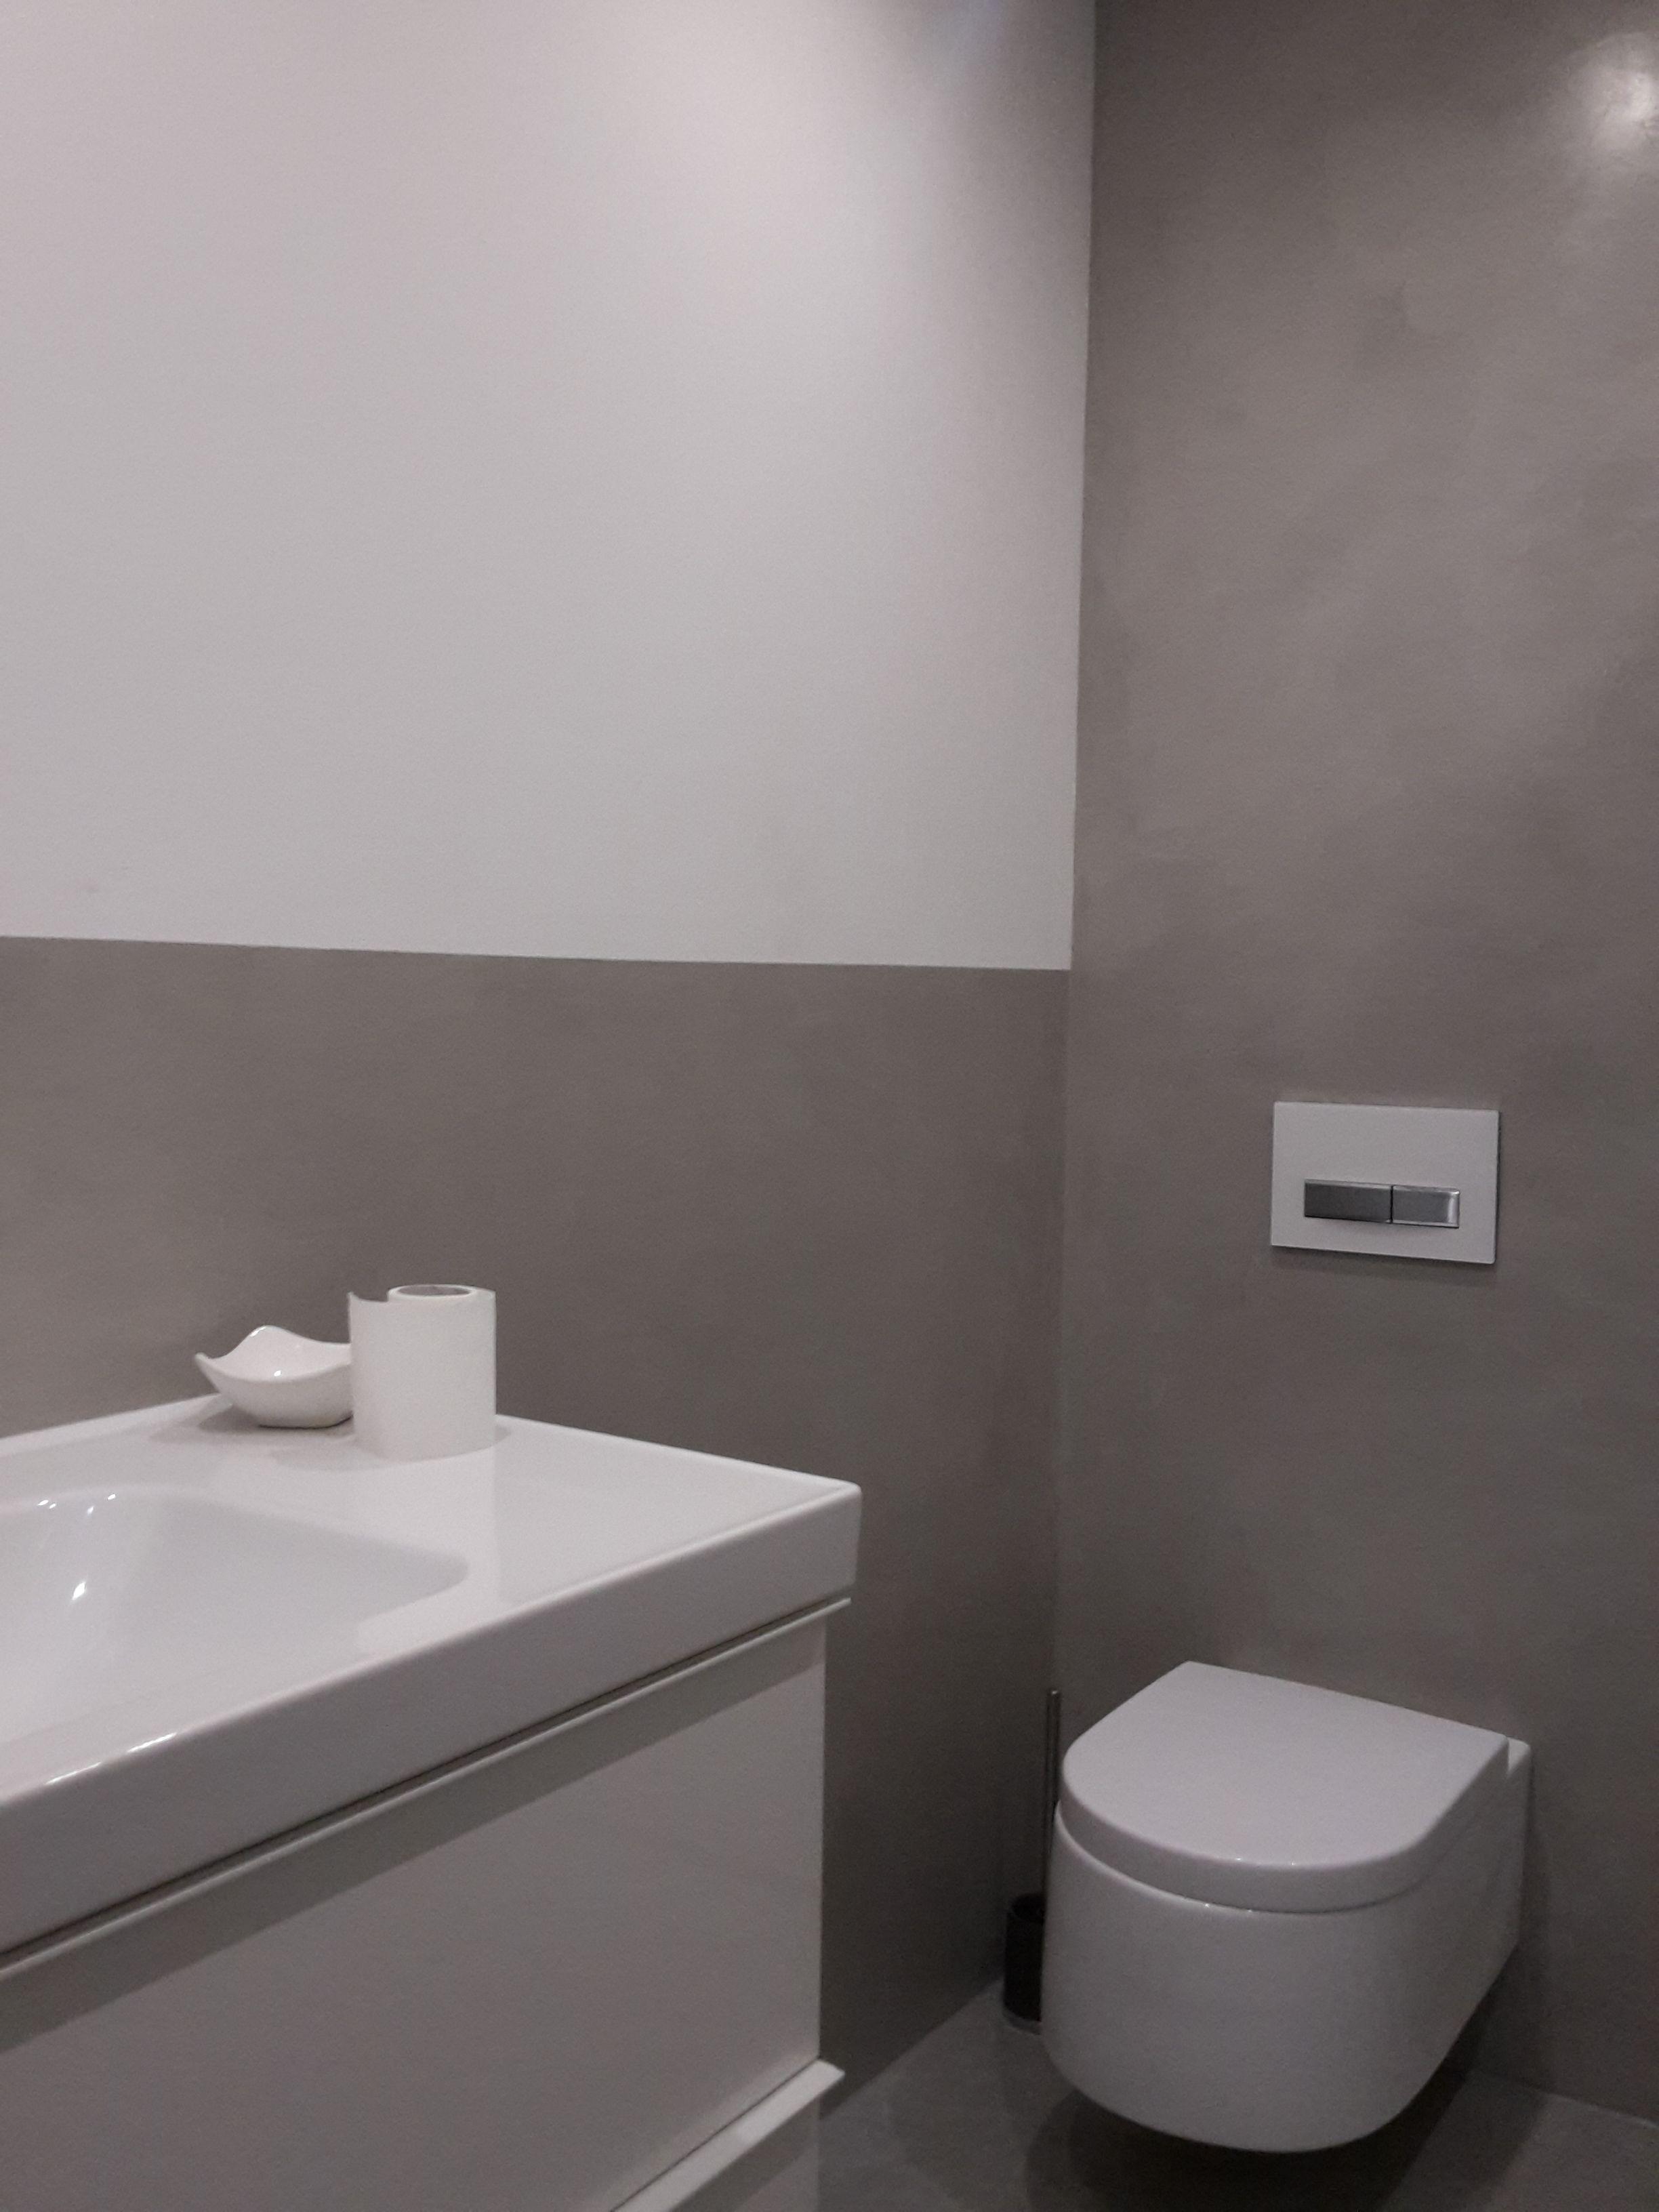 Fugenloses Bad Design Beton Optik Fugenloses Bad Bad Design Fugenlose Dusche